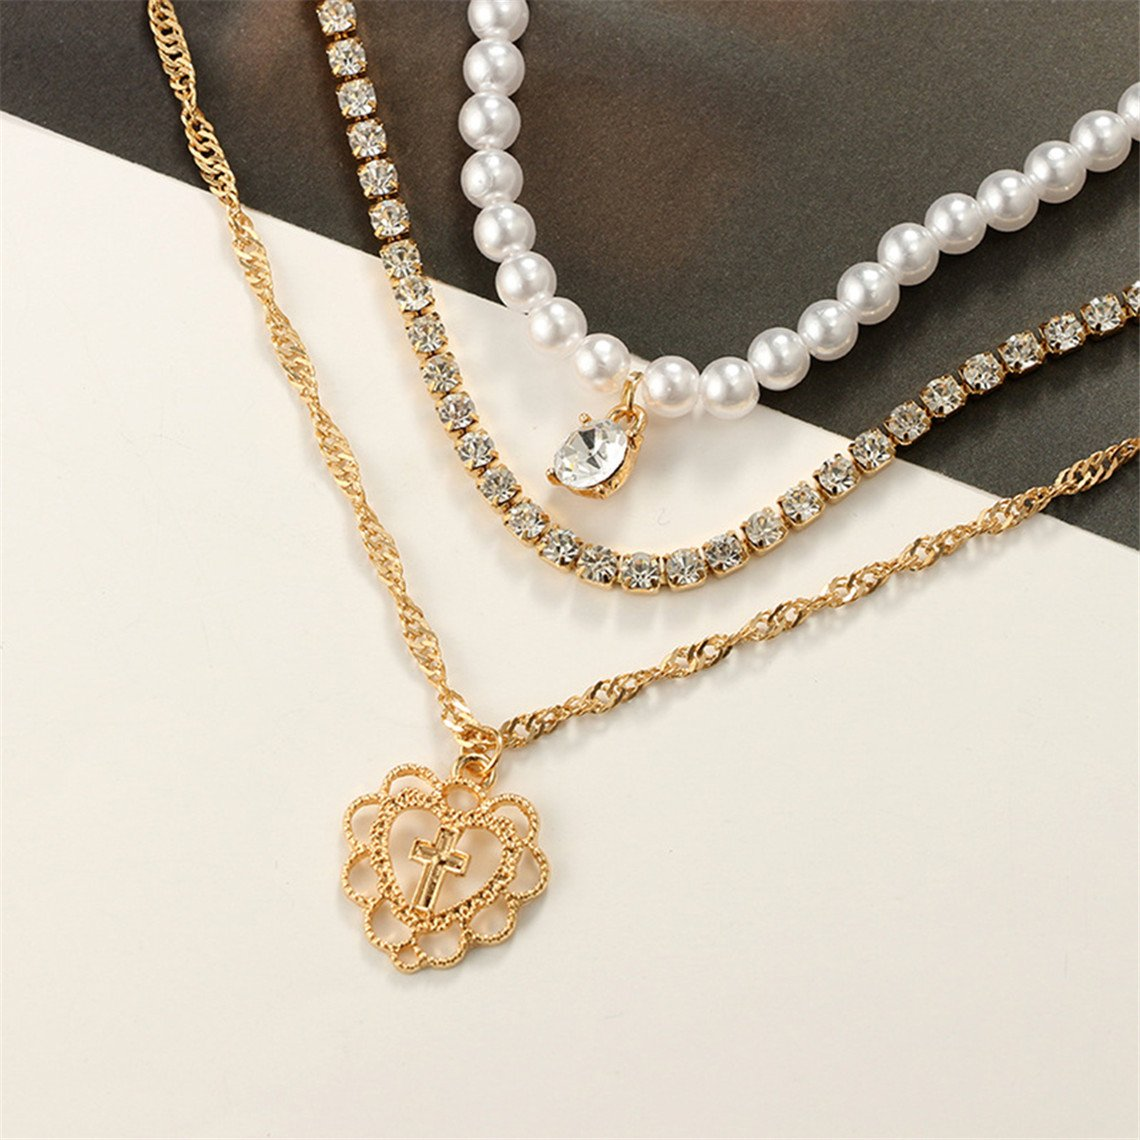 Rurah Women Imitation Pearls Necklace Jewelry Rhinestone Multi Layer Necklace Charm Pendant necklace